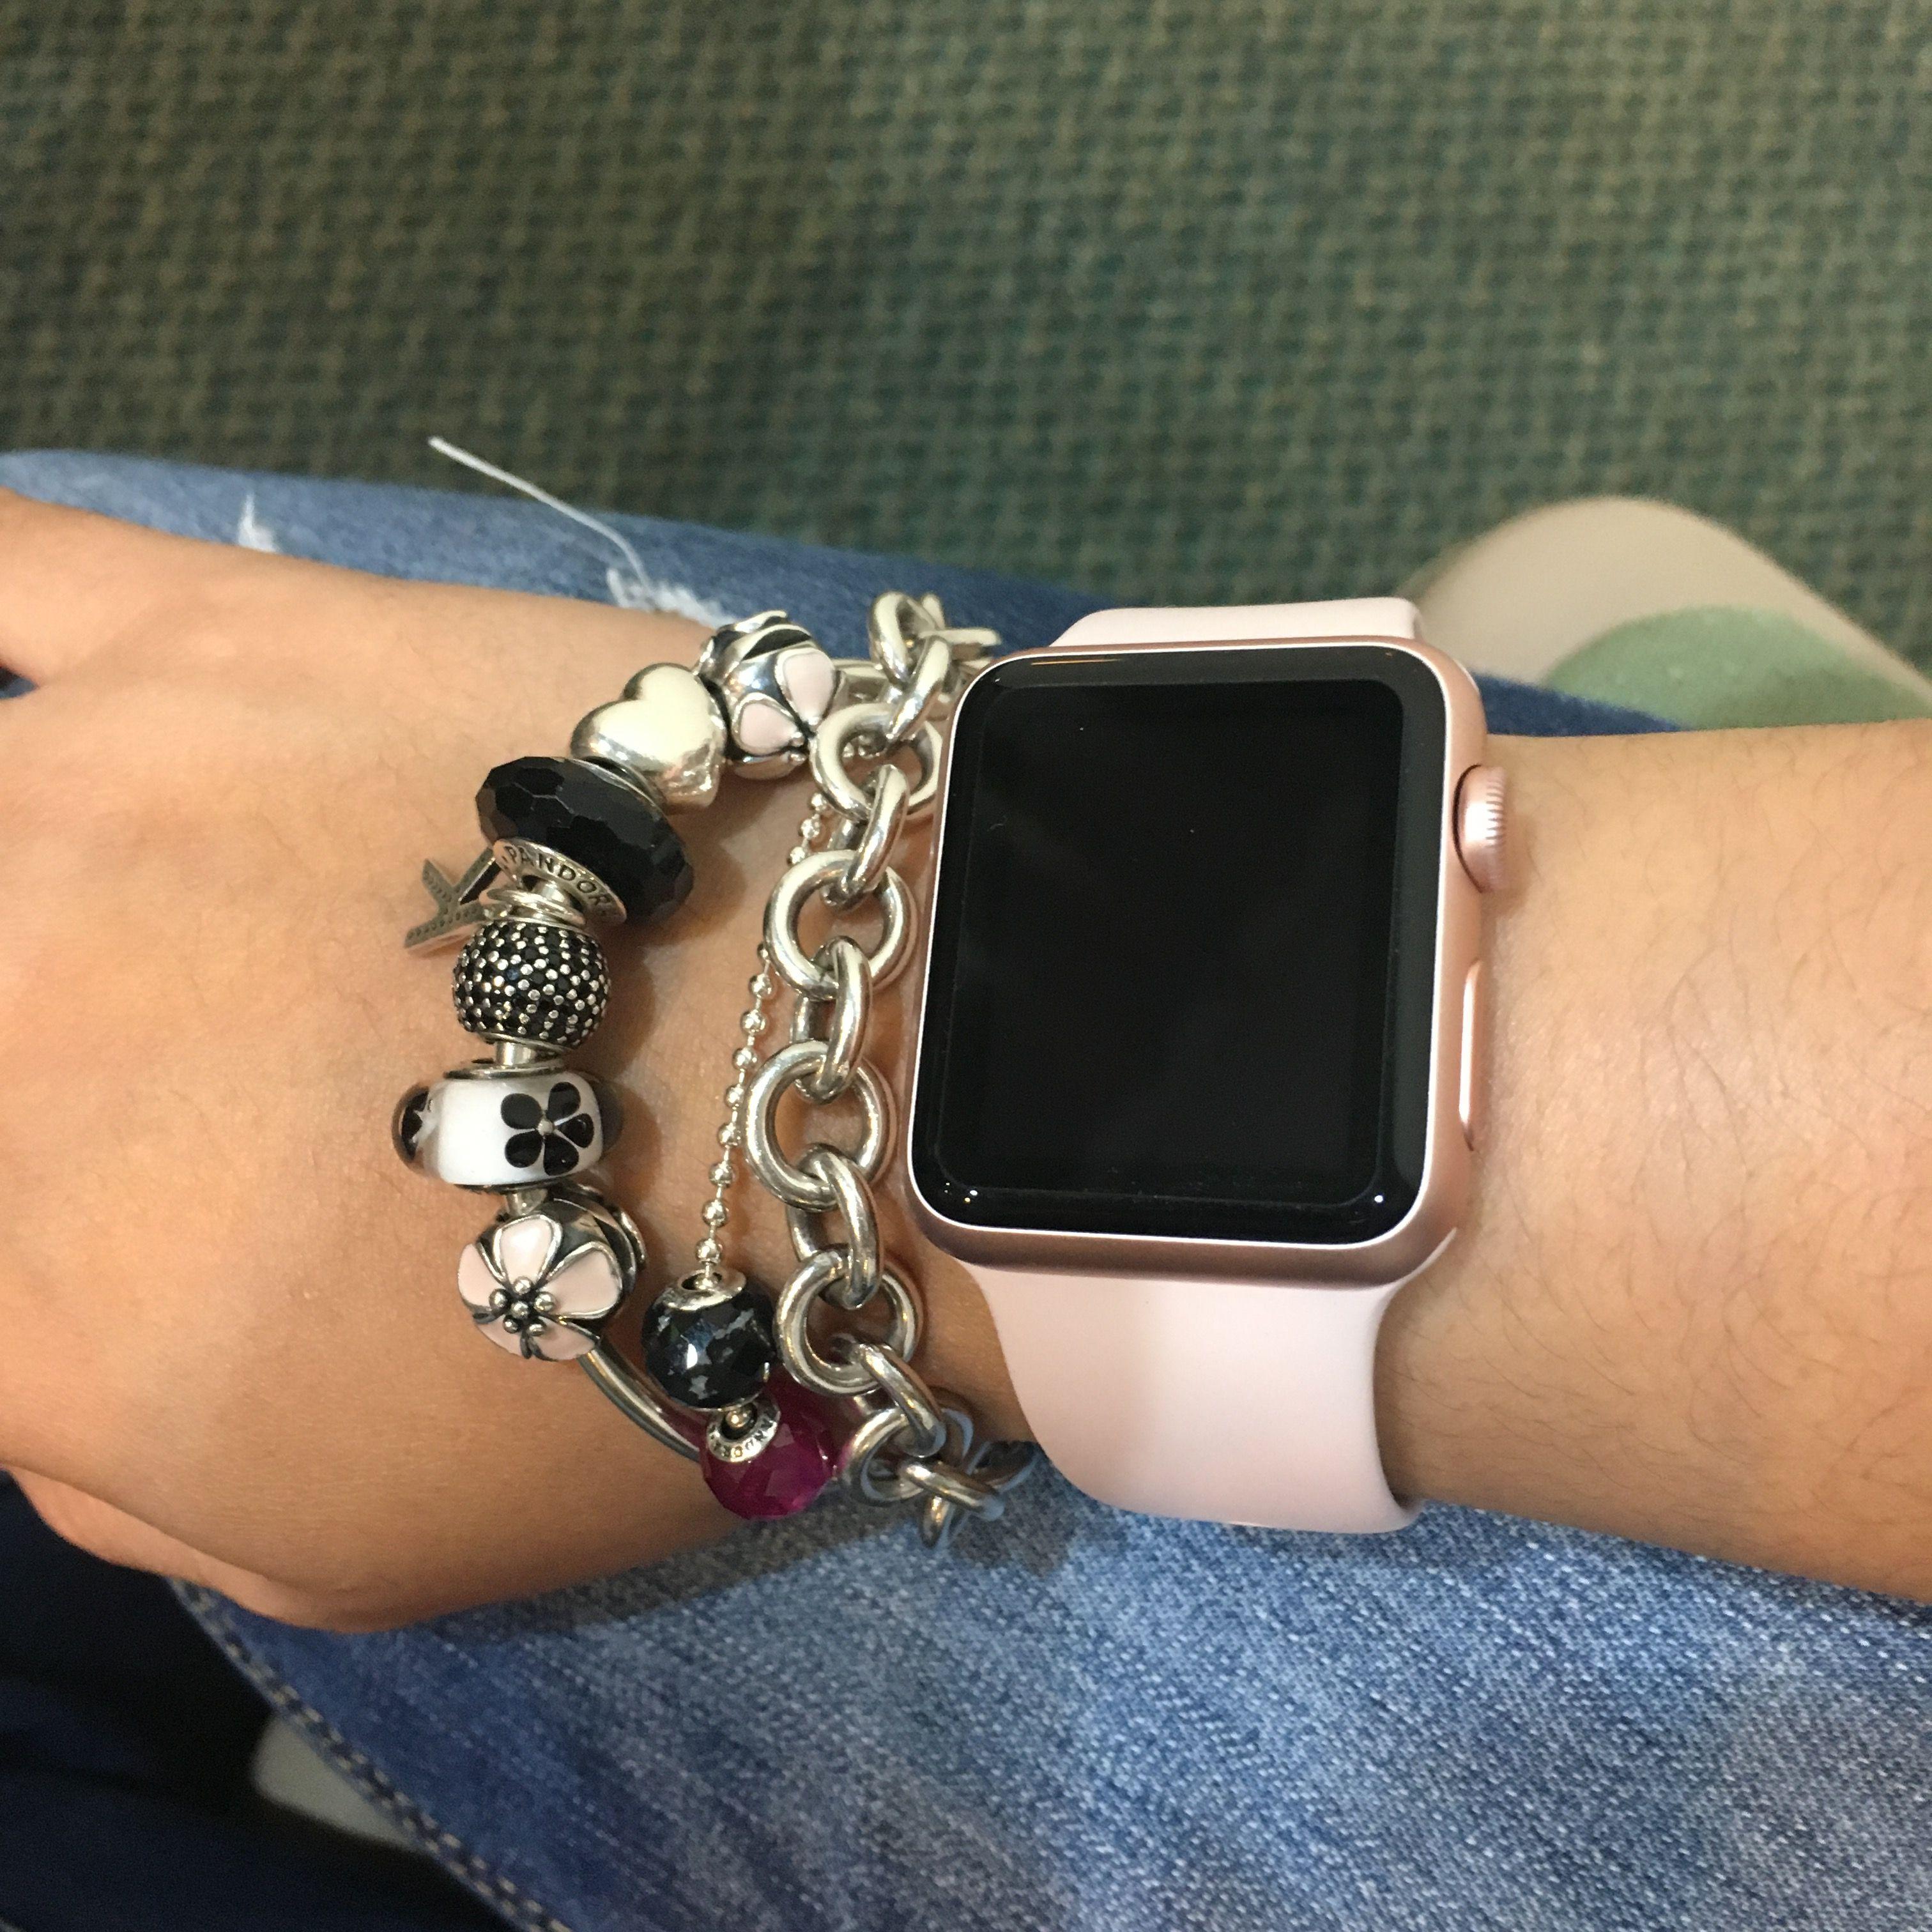 Apple watch pandora tiffany&co